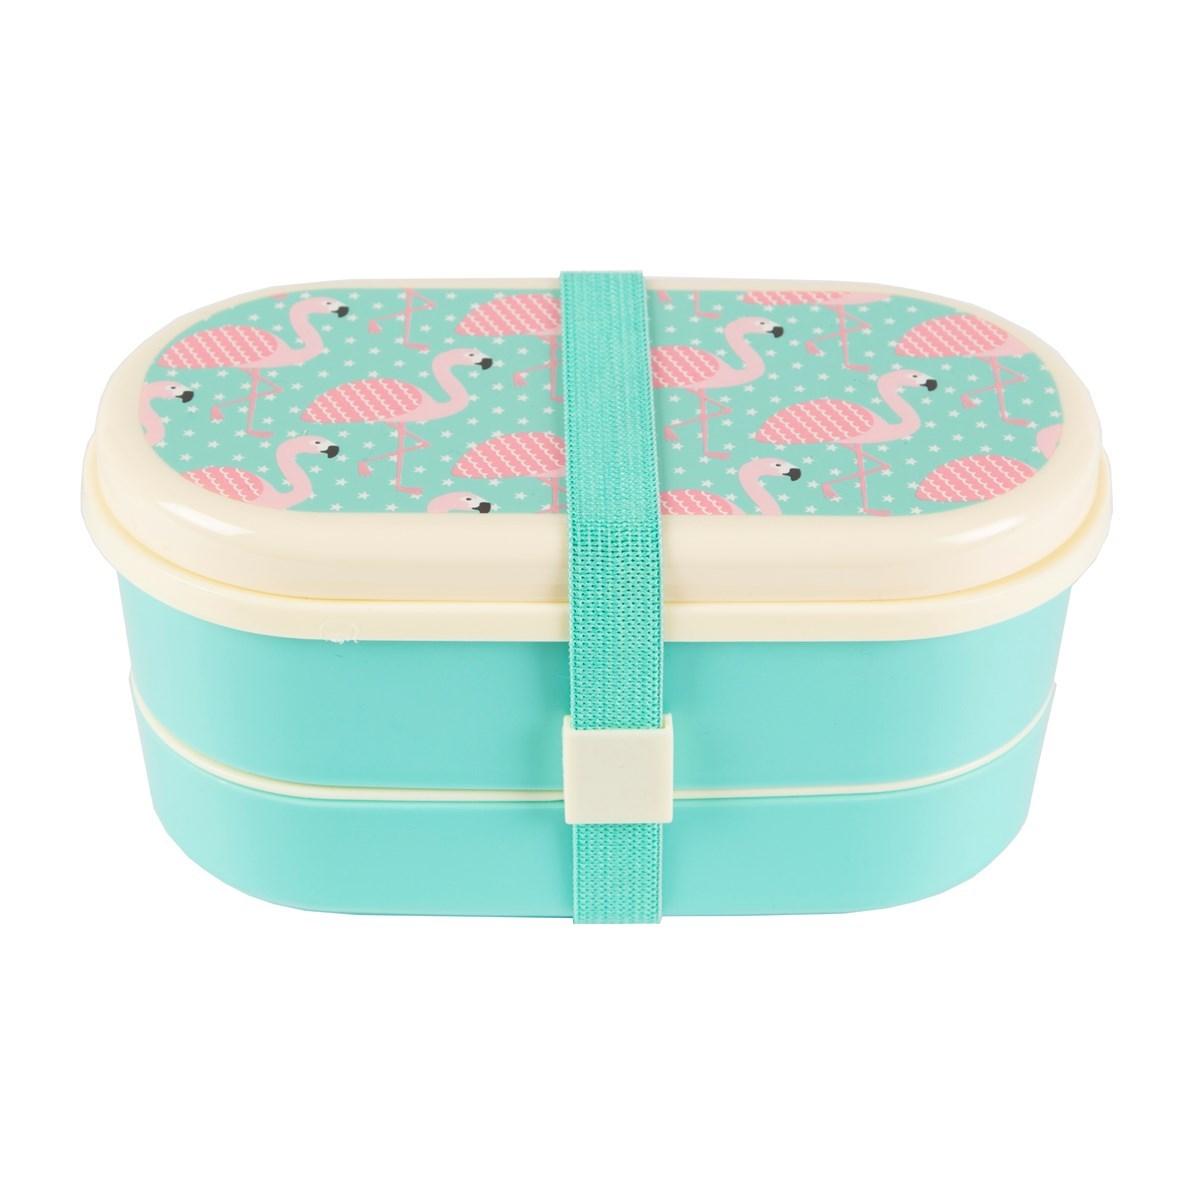 tropical flamingo bento lunch box. Black Bedroom Furniture Sets. Home Design Ideas